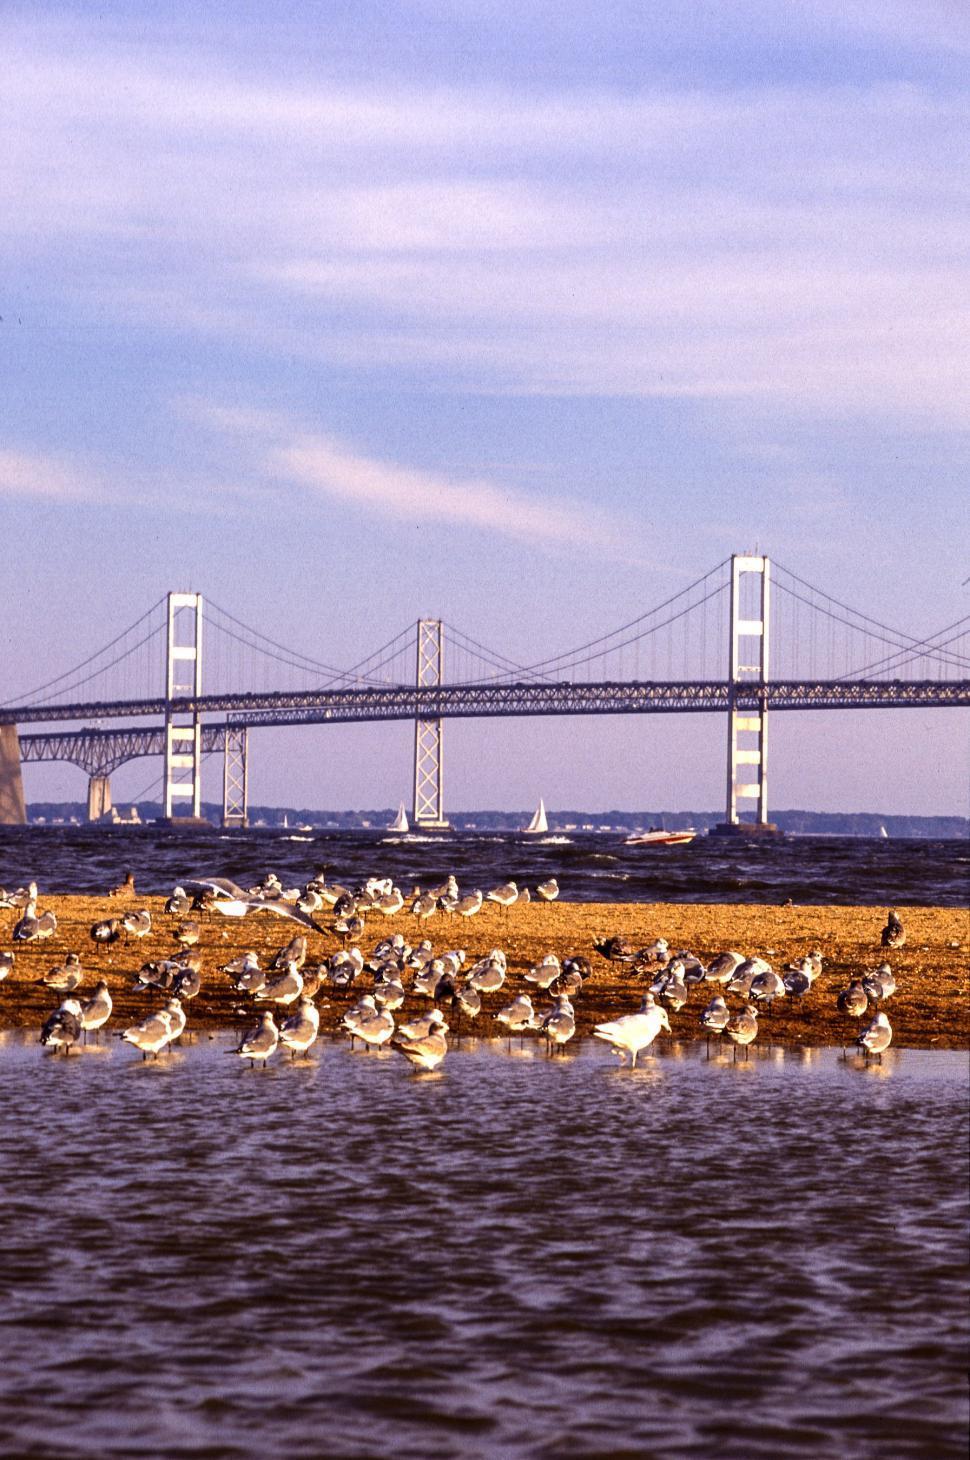 Download Free Stock HD Photo of Chesapeake Bay Bridge Online